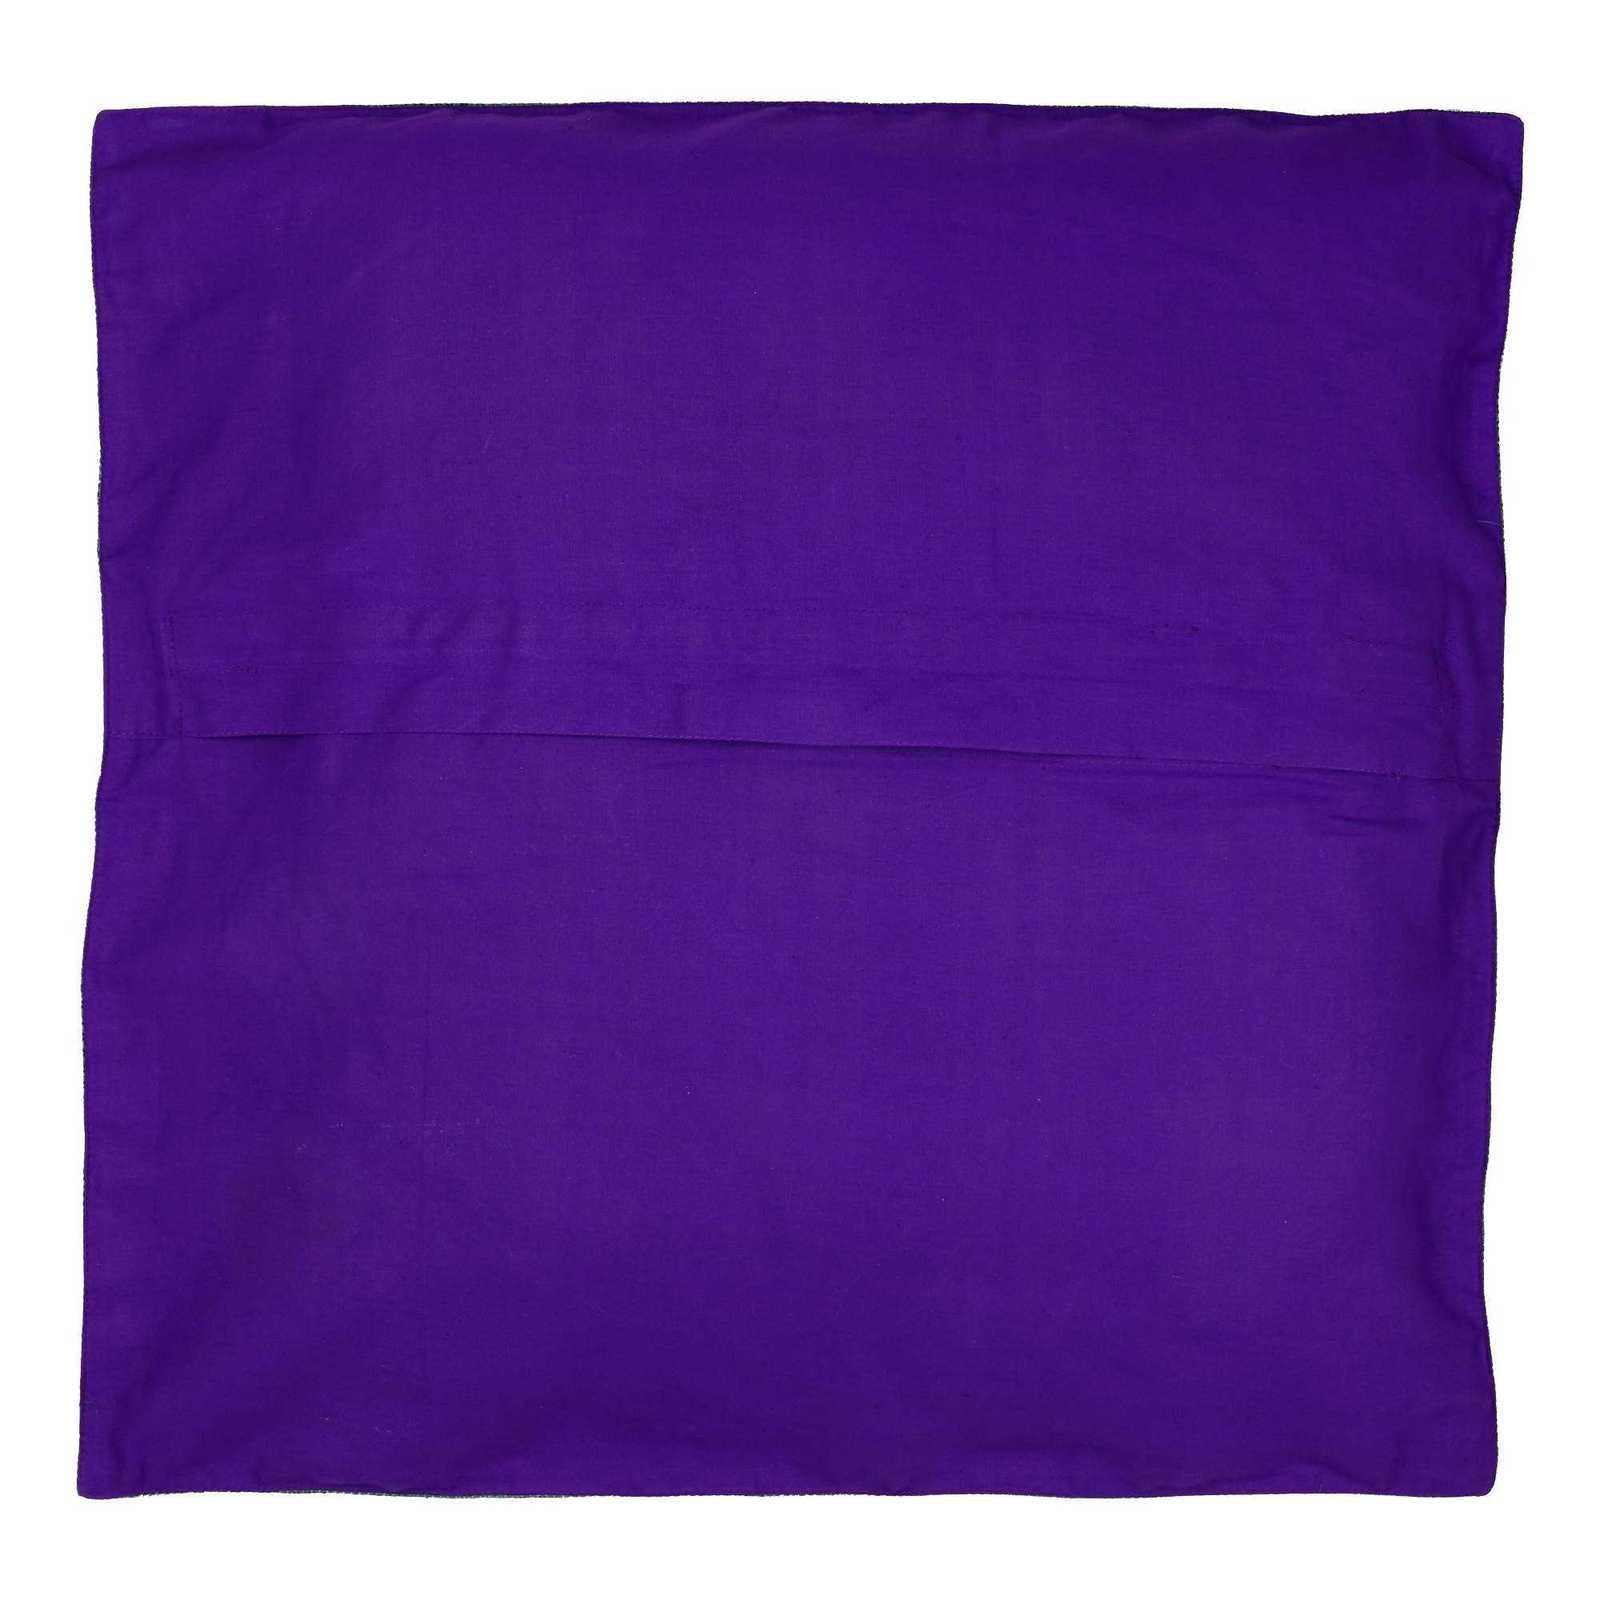 Indian Decorative Silk Cushion Pillow Covers 24 X 24 Sofa  : cushioncoversvioletblue24x241 from www.bonanza.com size 1600 x 1600 jpeg 67kB